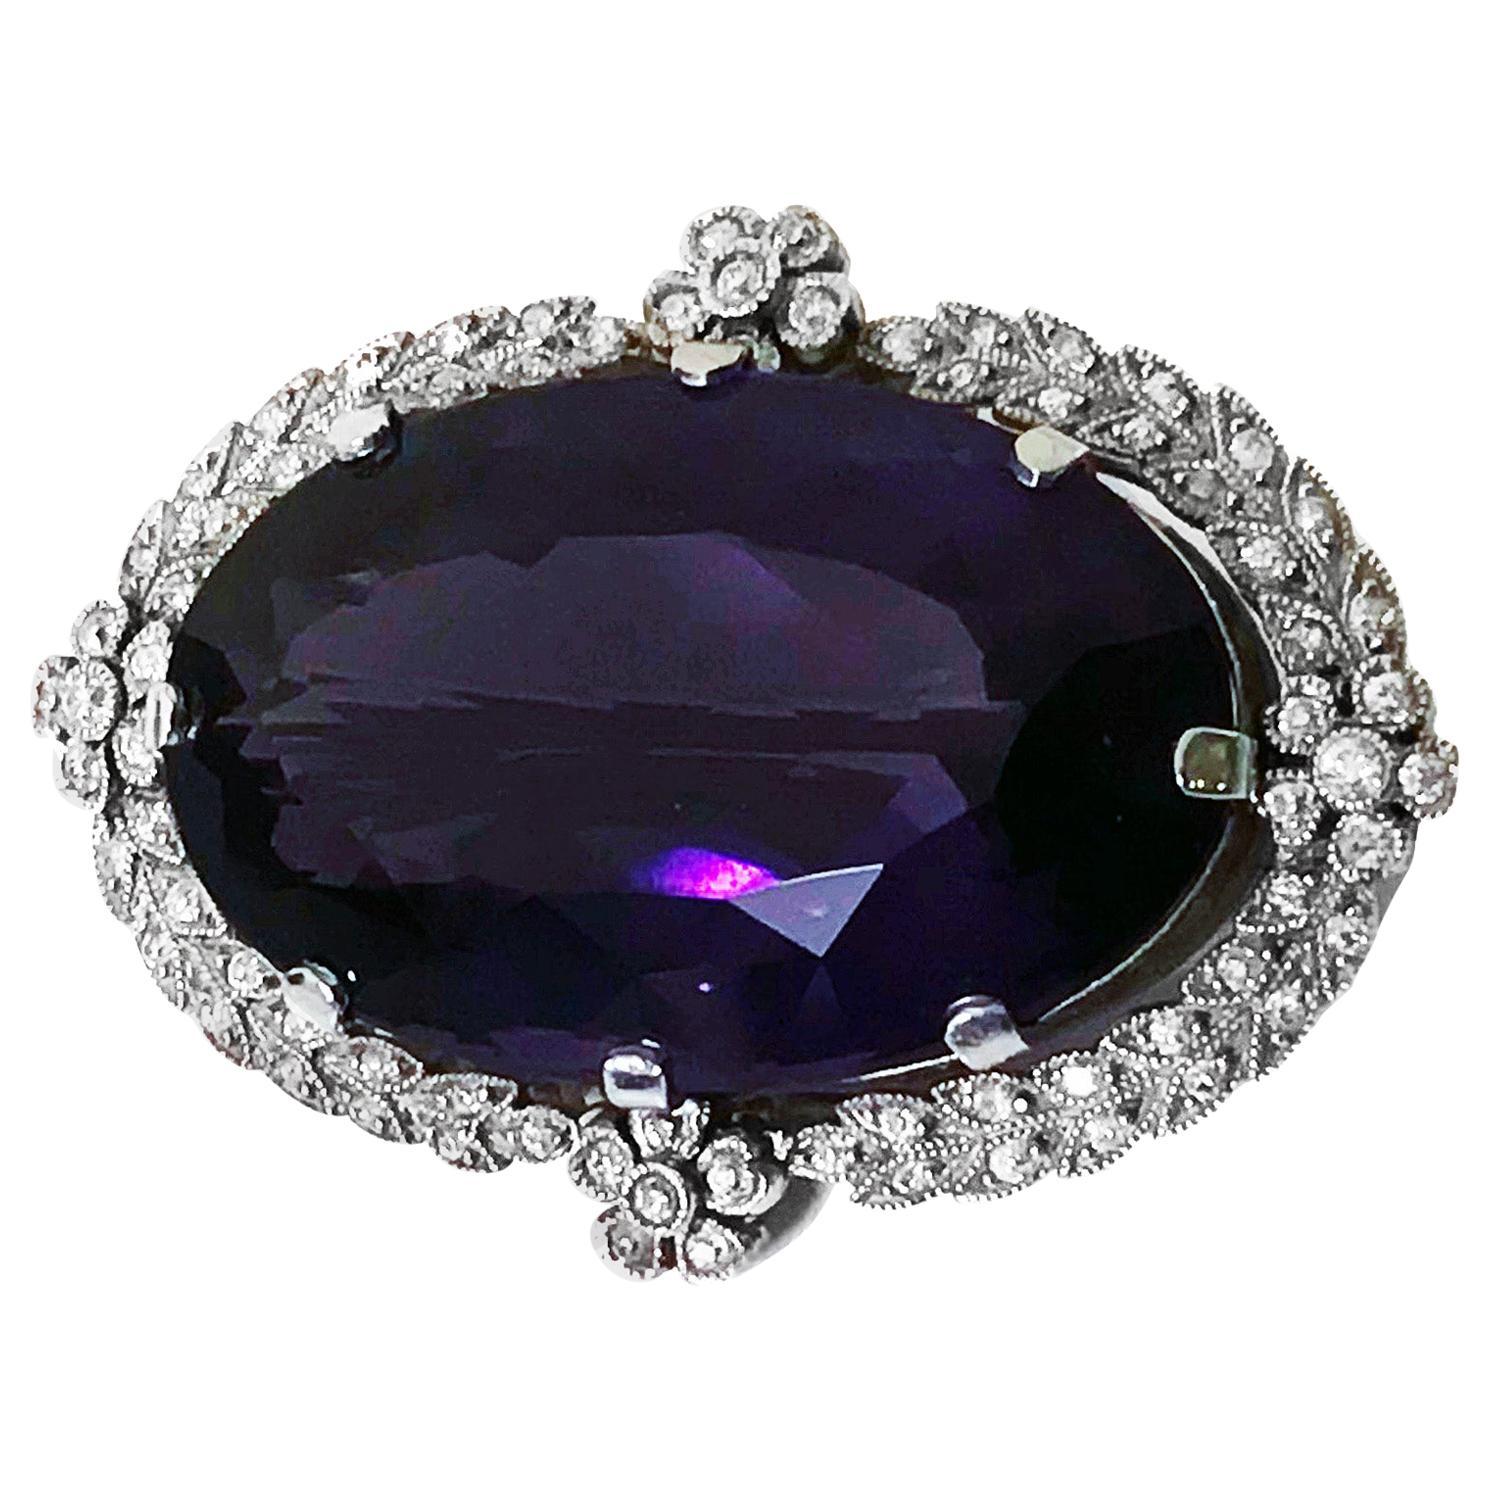 Belle Époque Amethyst Diamond Brooch Pendant